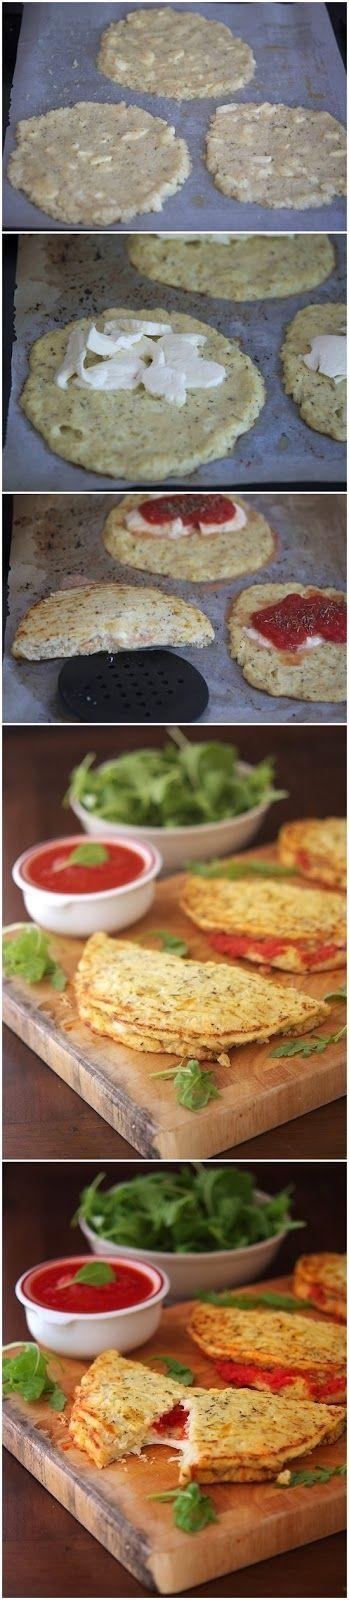 Placer Blog: Cauliflower Crust Calzone